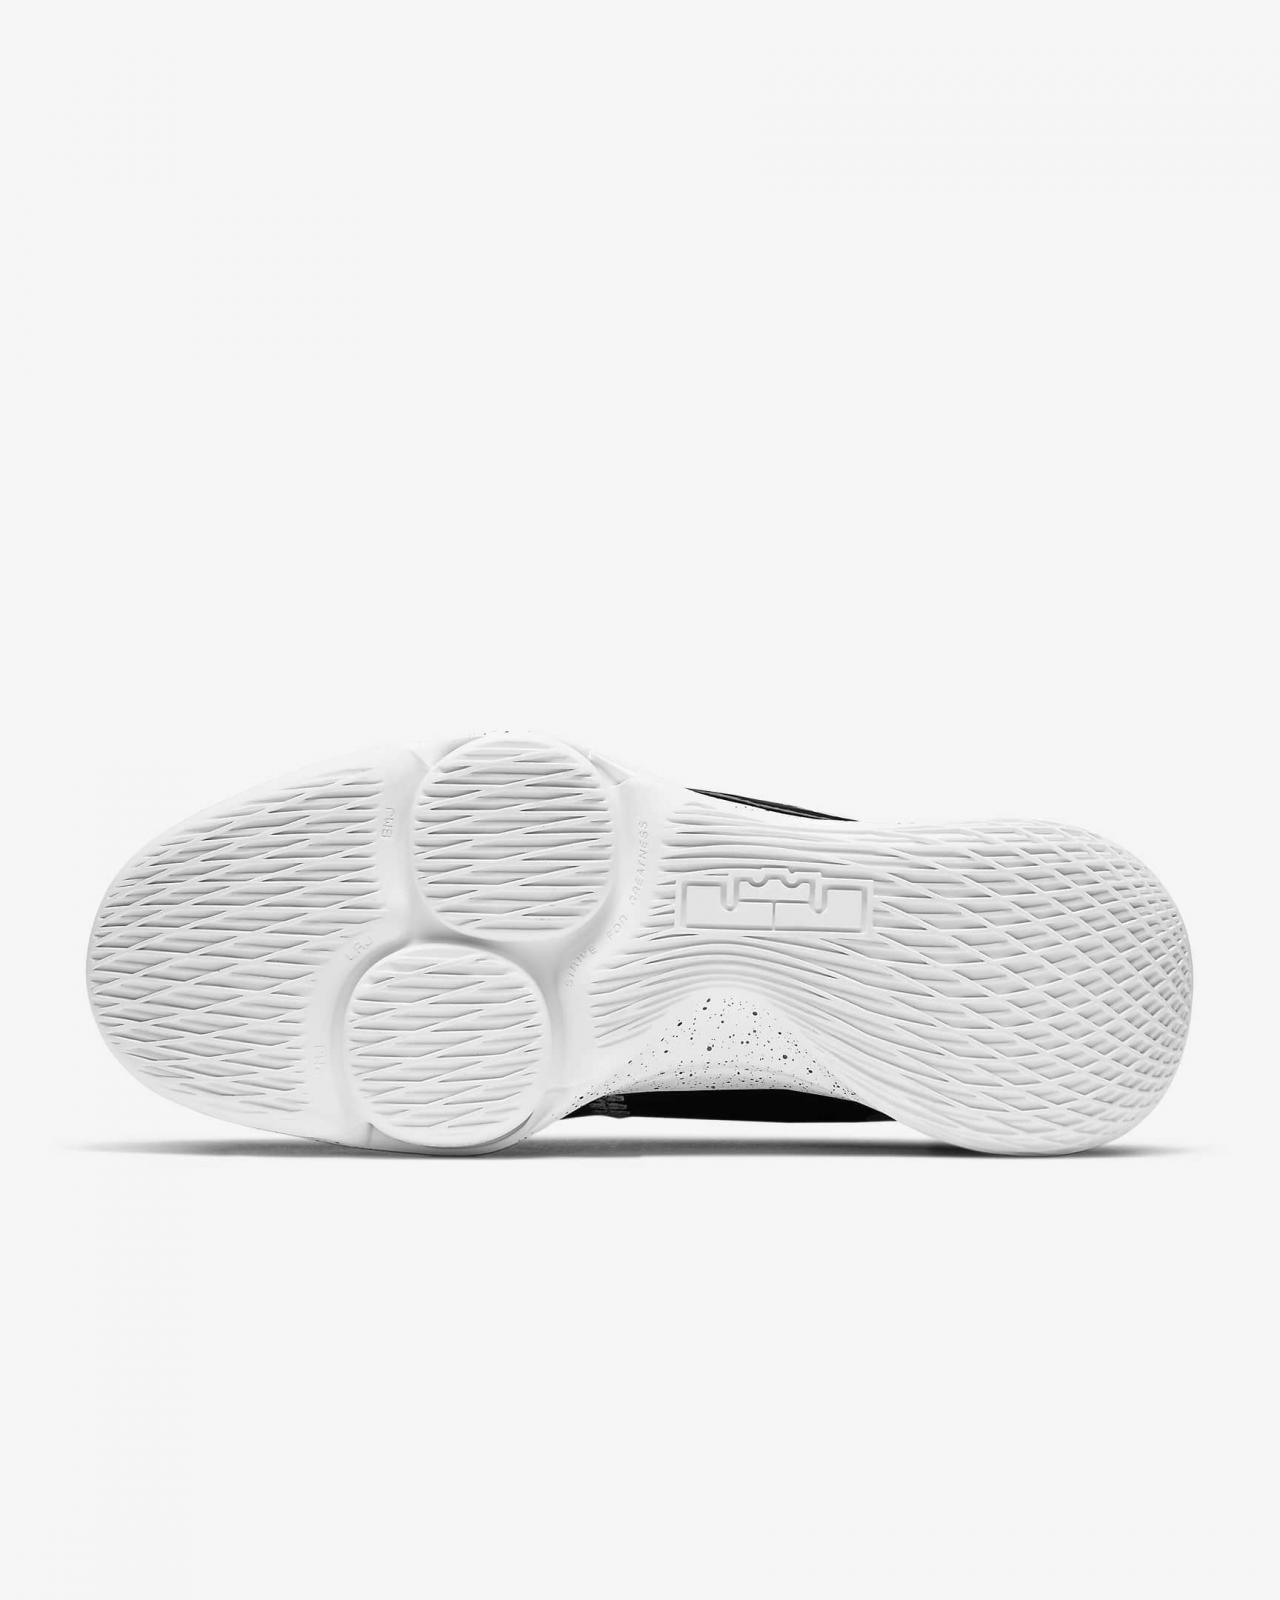 Nike Basketball推出全新黑/白/金属银色LeBron Witness V EP